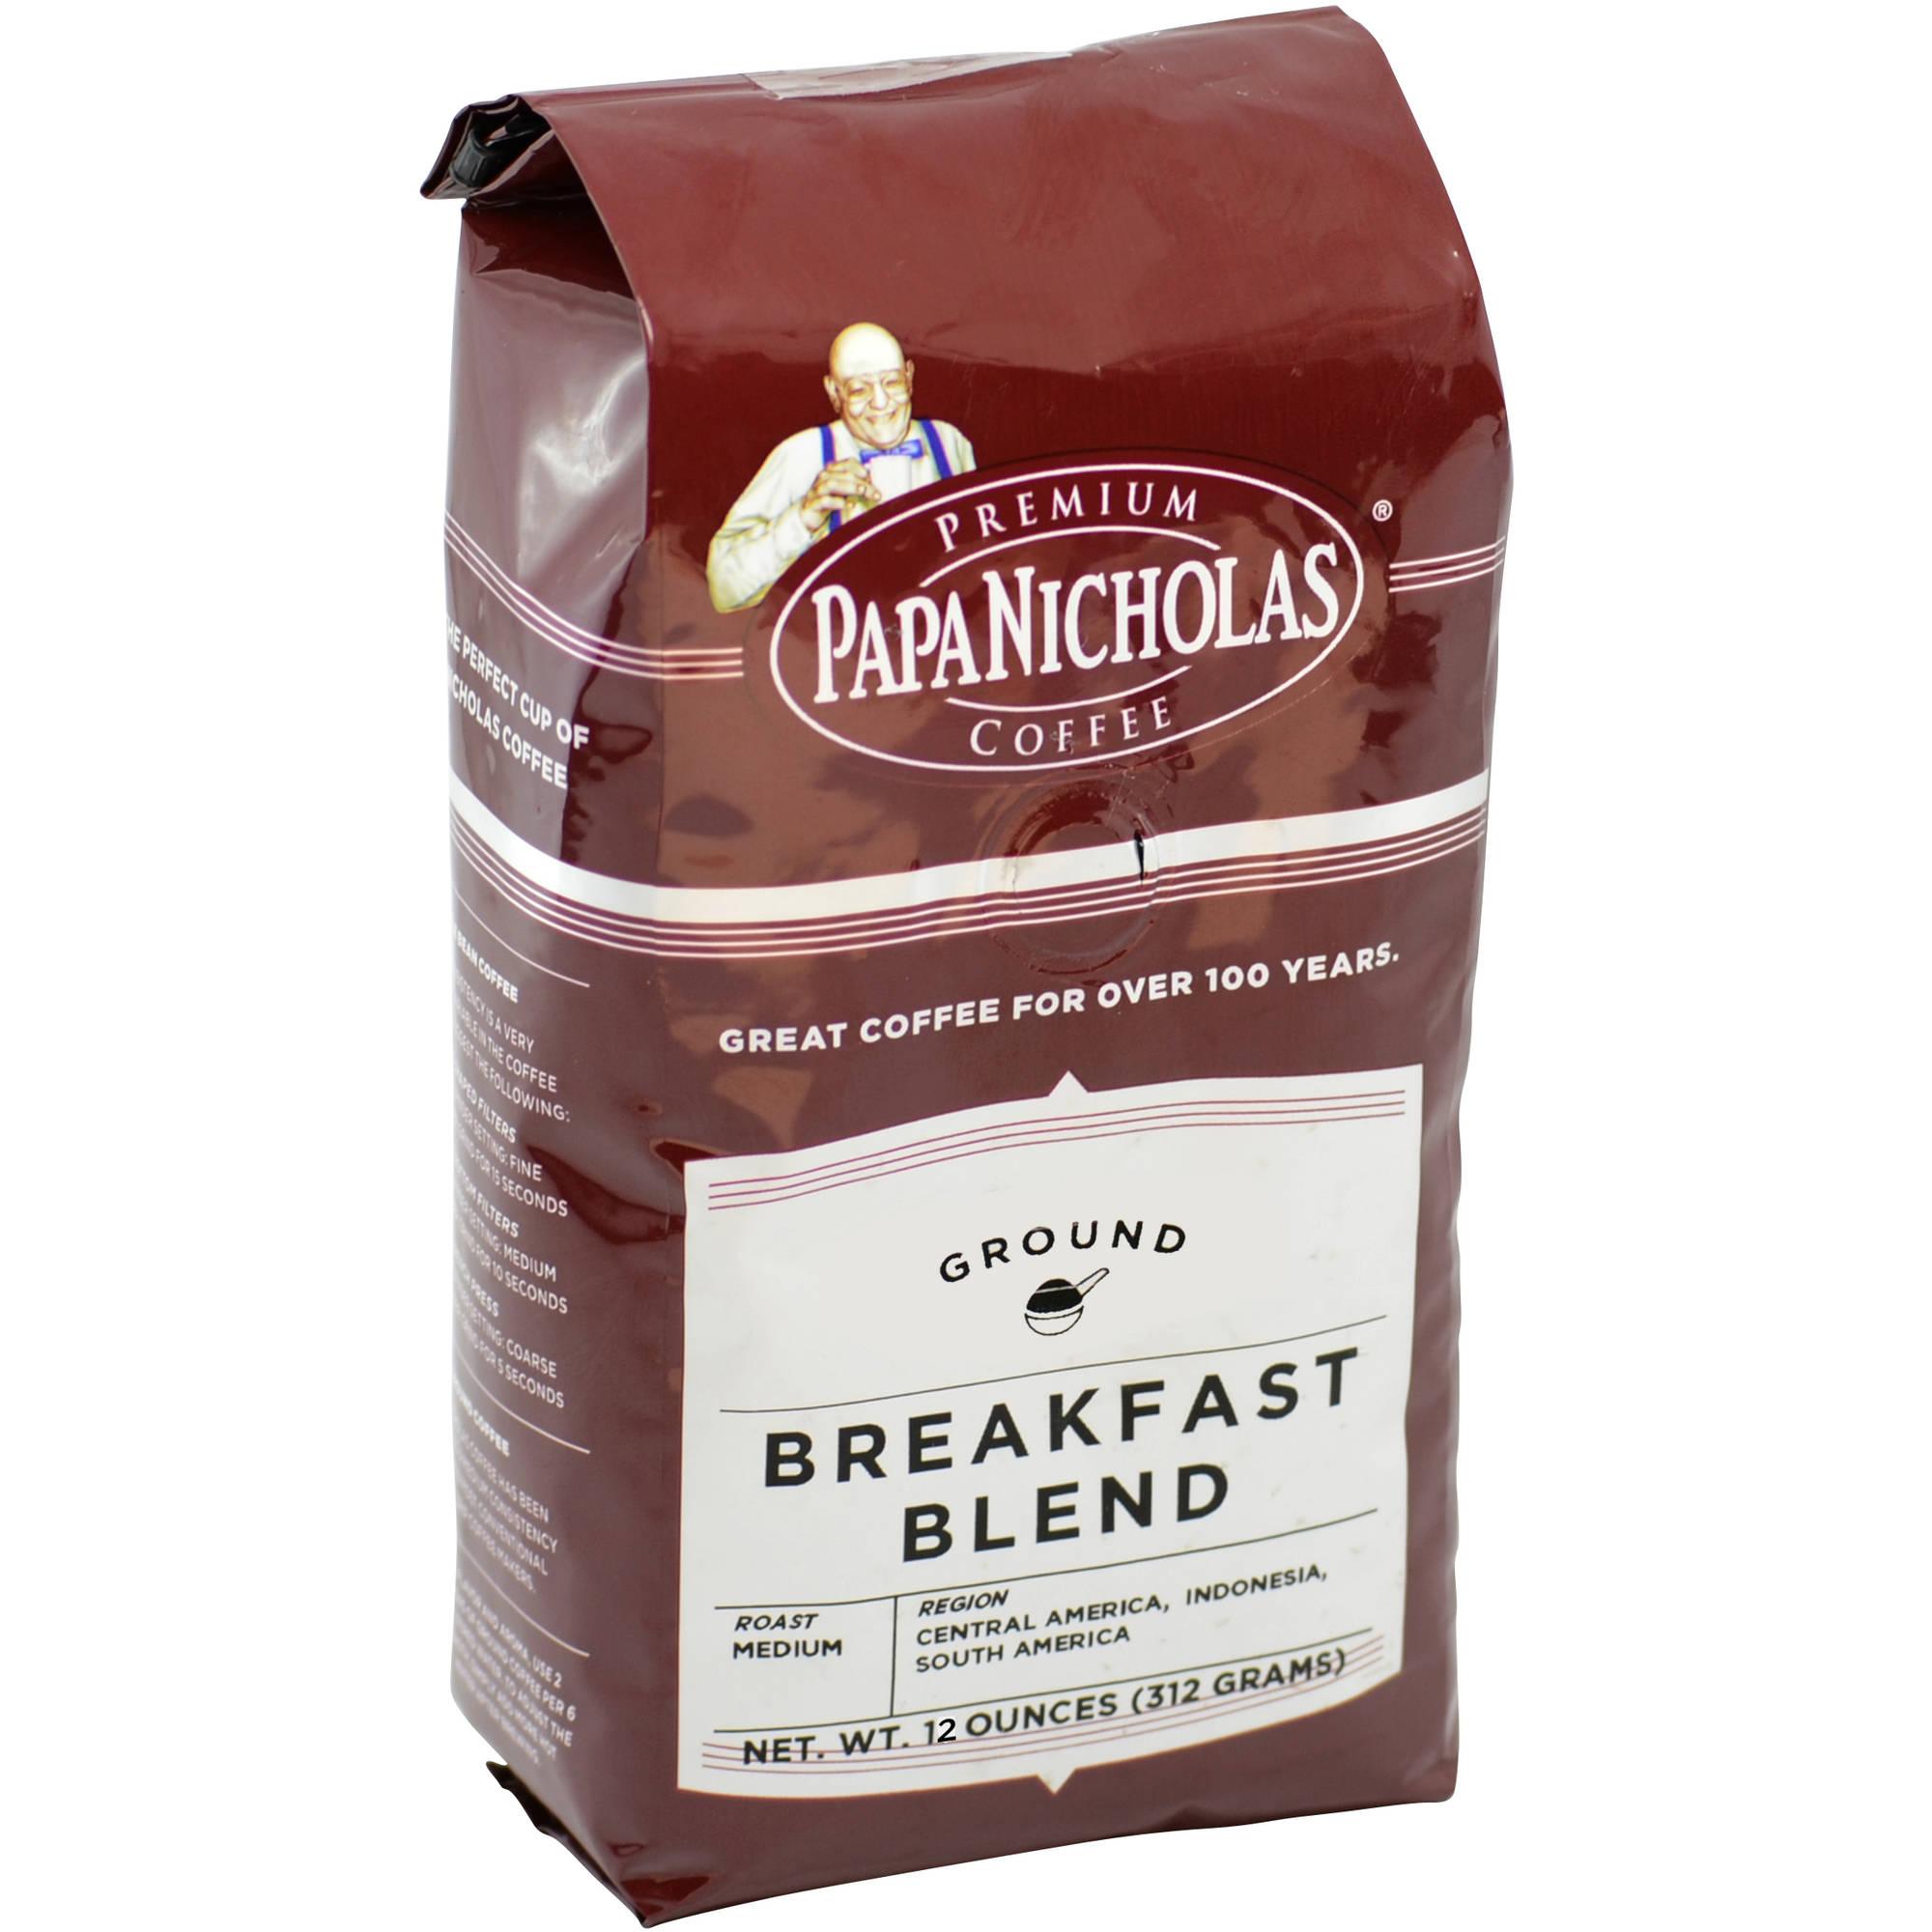 PapaNicholas Coffee Breakfast Blend Ground Coffee, 12 oz